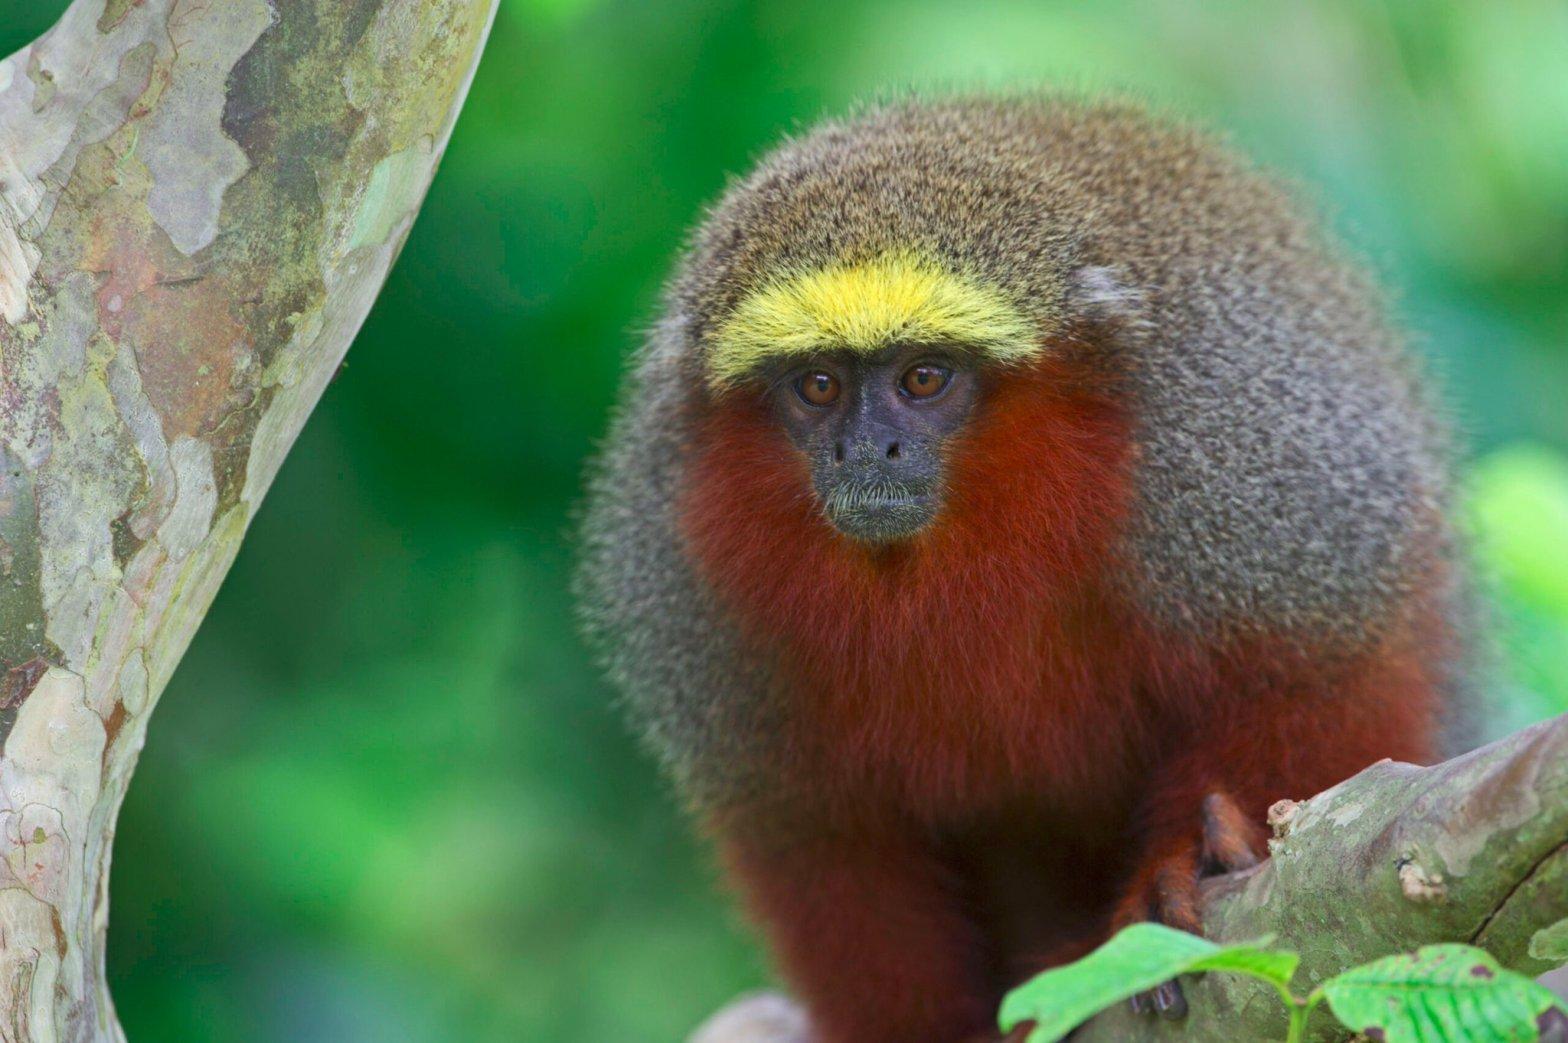 Dusky Titi Monkey, found in the Amazon rainforest.